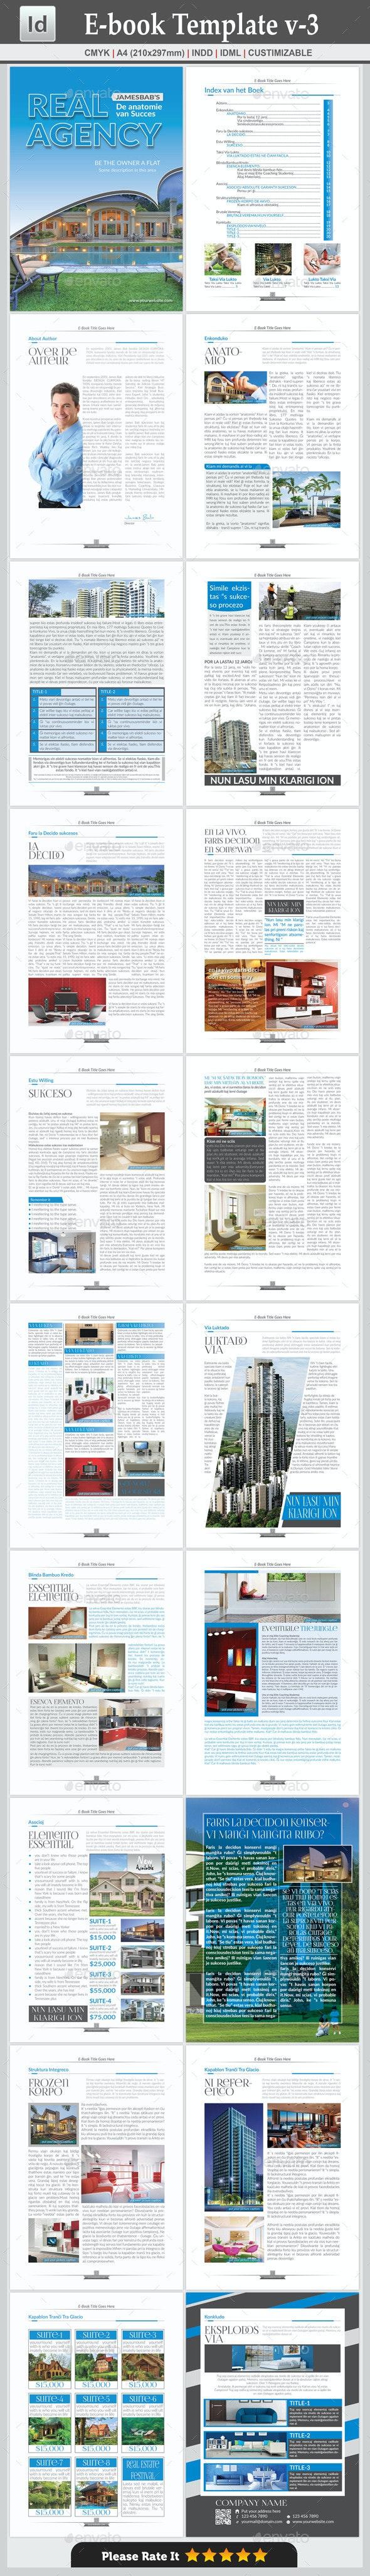 E-Book Template v-3 - Digital Books ePublishing